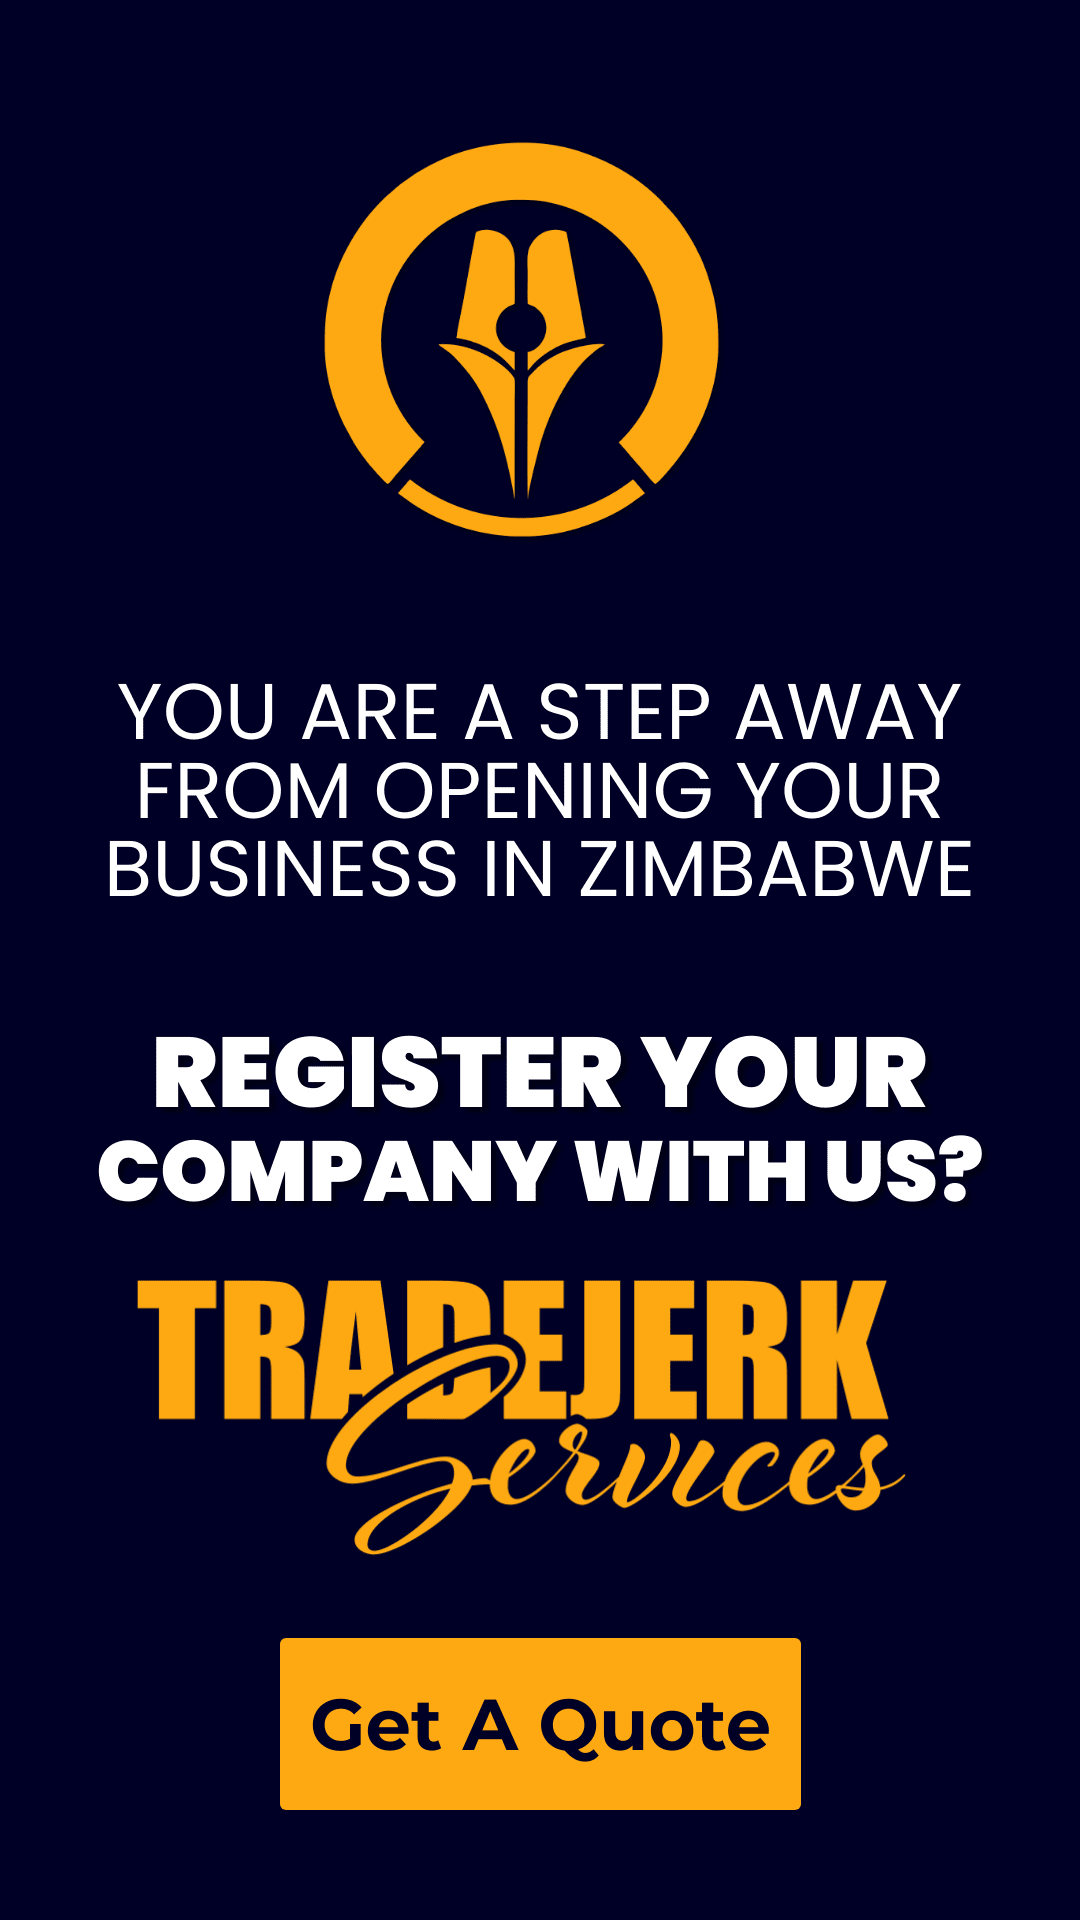 Tradejerk Services